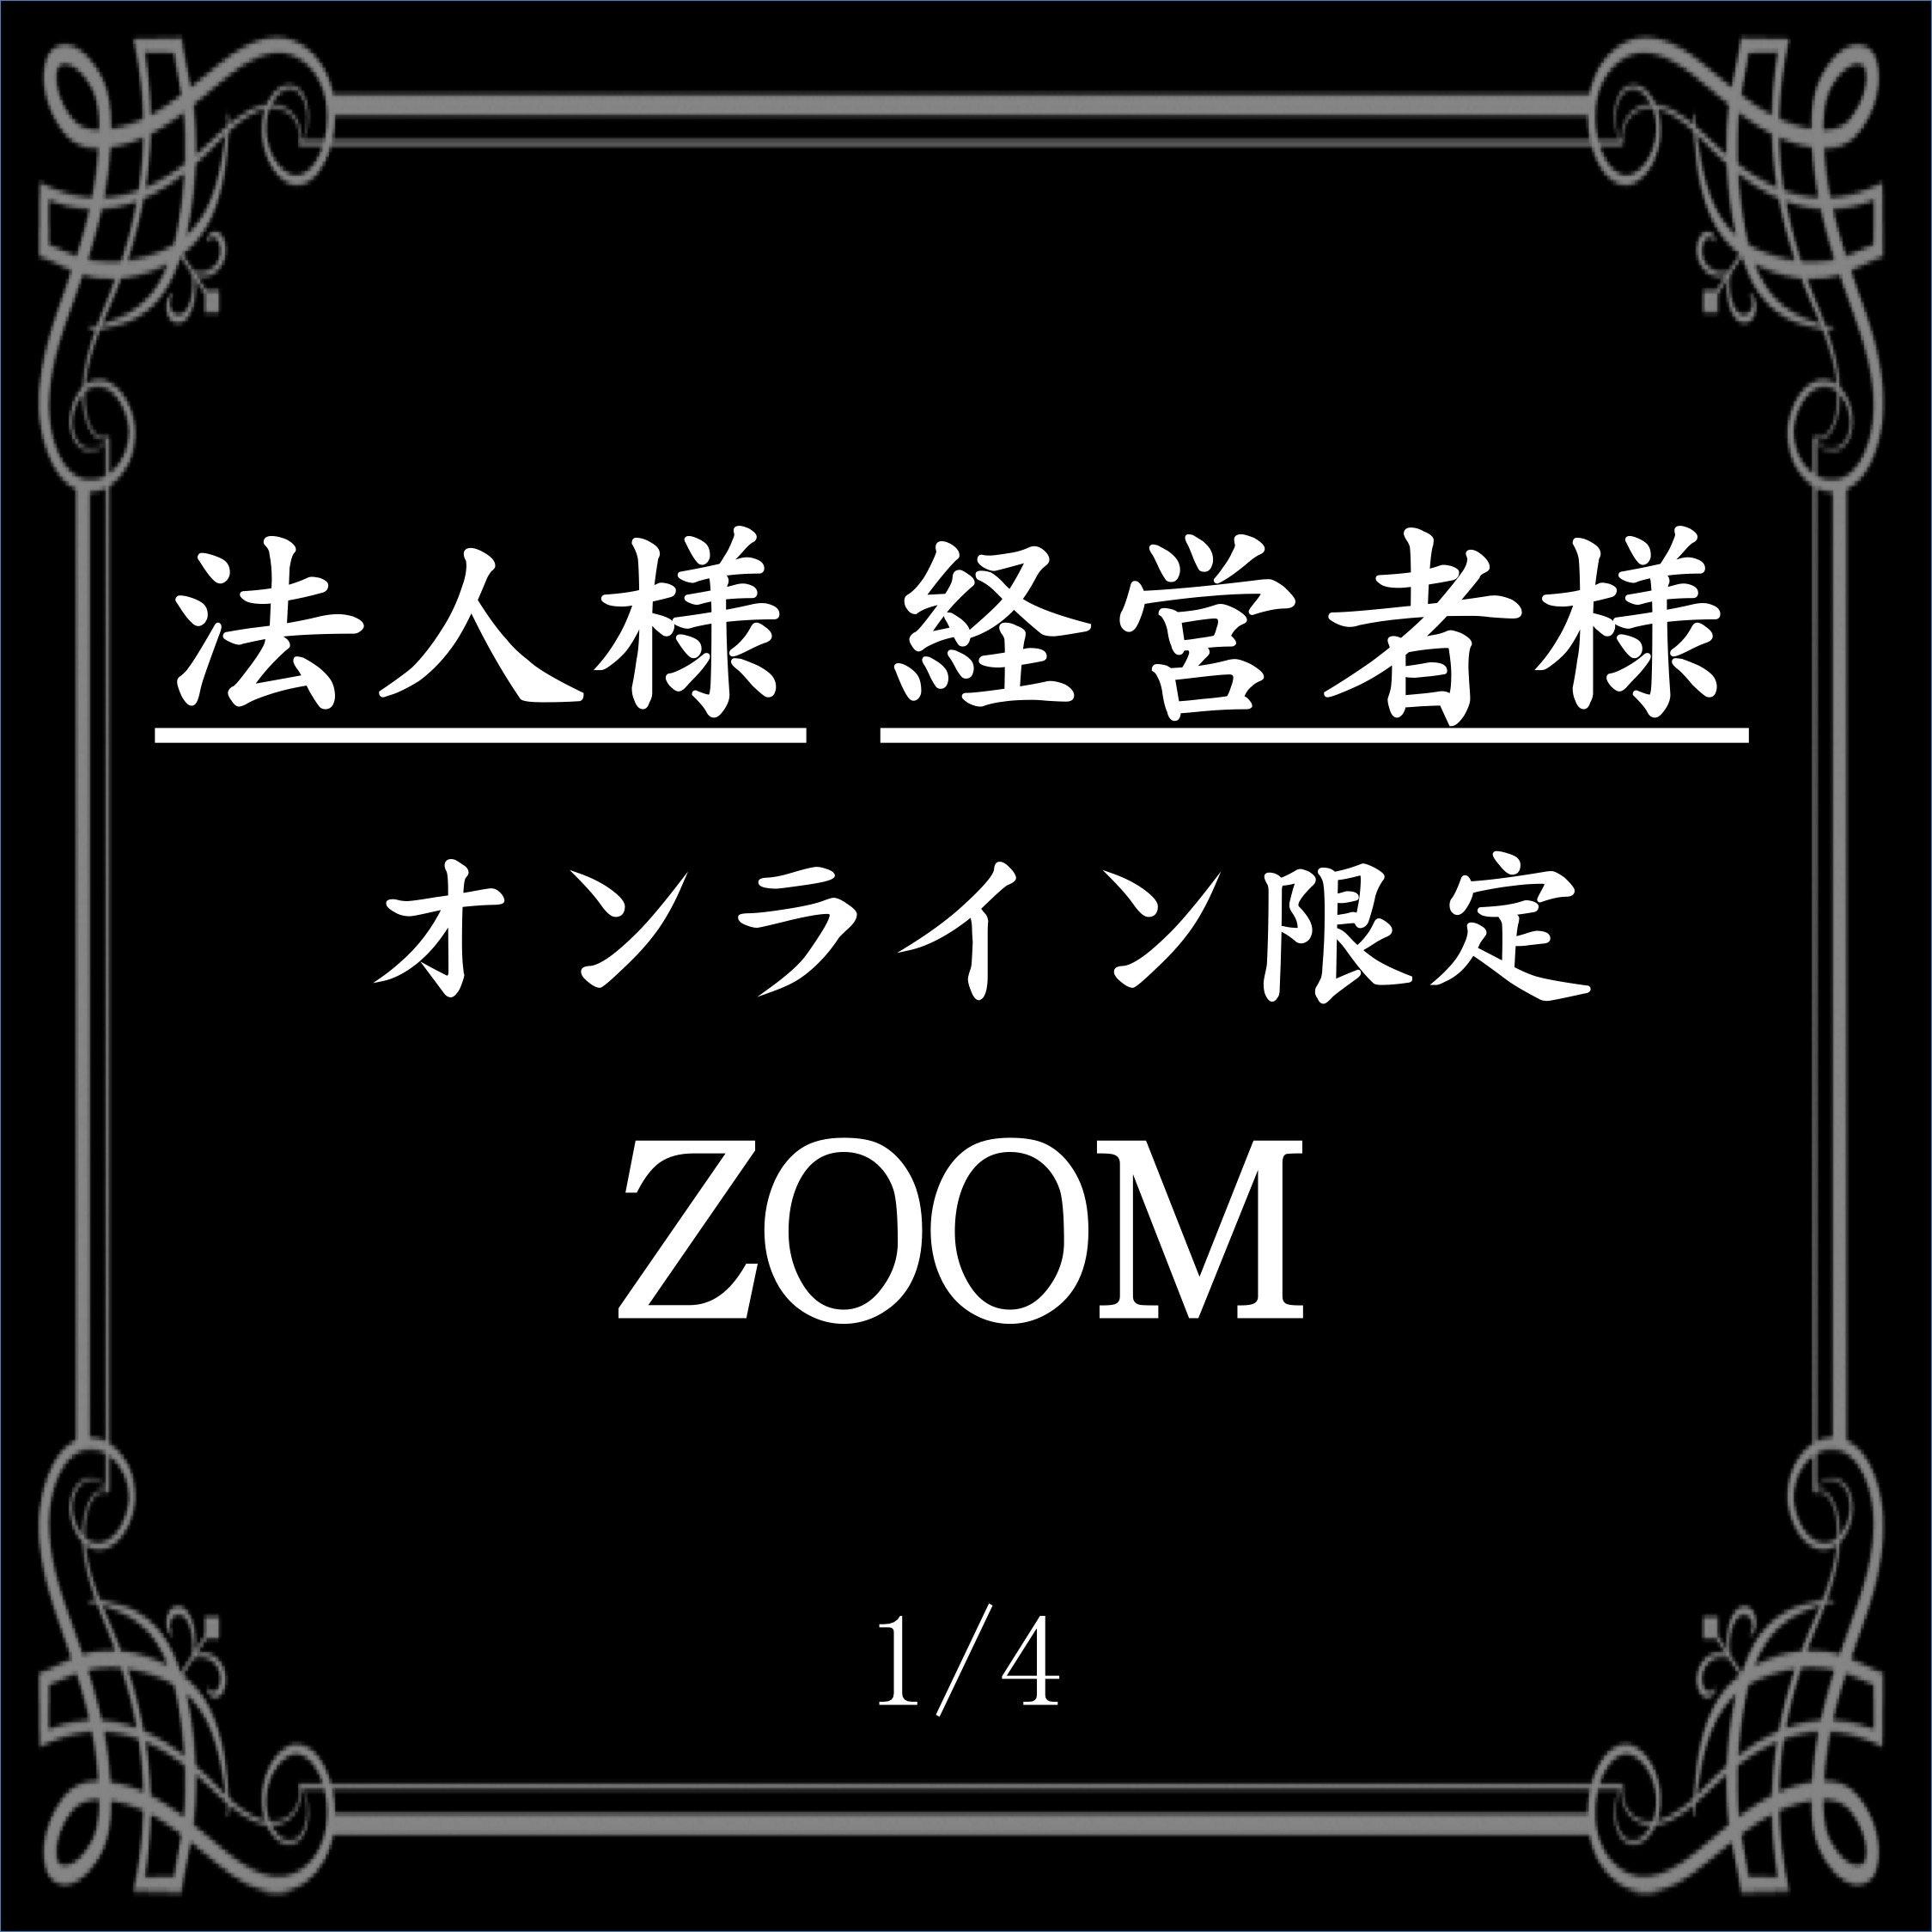 ZOOM 鑑定  輝く未来に向けて「今一番何をしたら」スムーズに動き出せるのかをお手伝いできます。のイメージその1